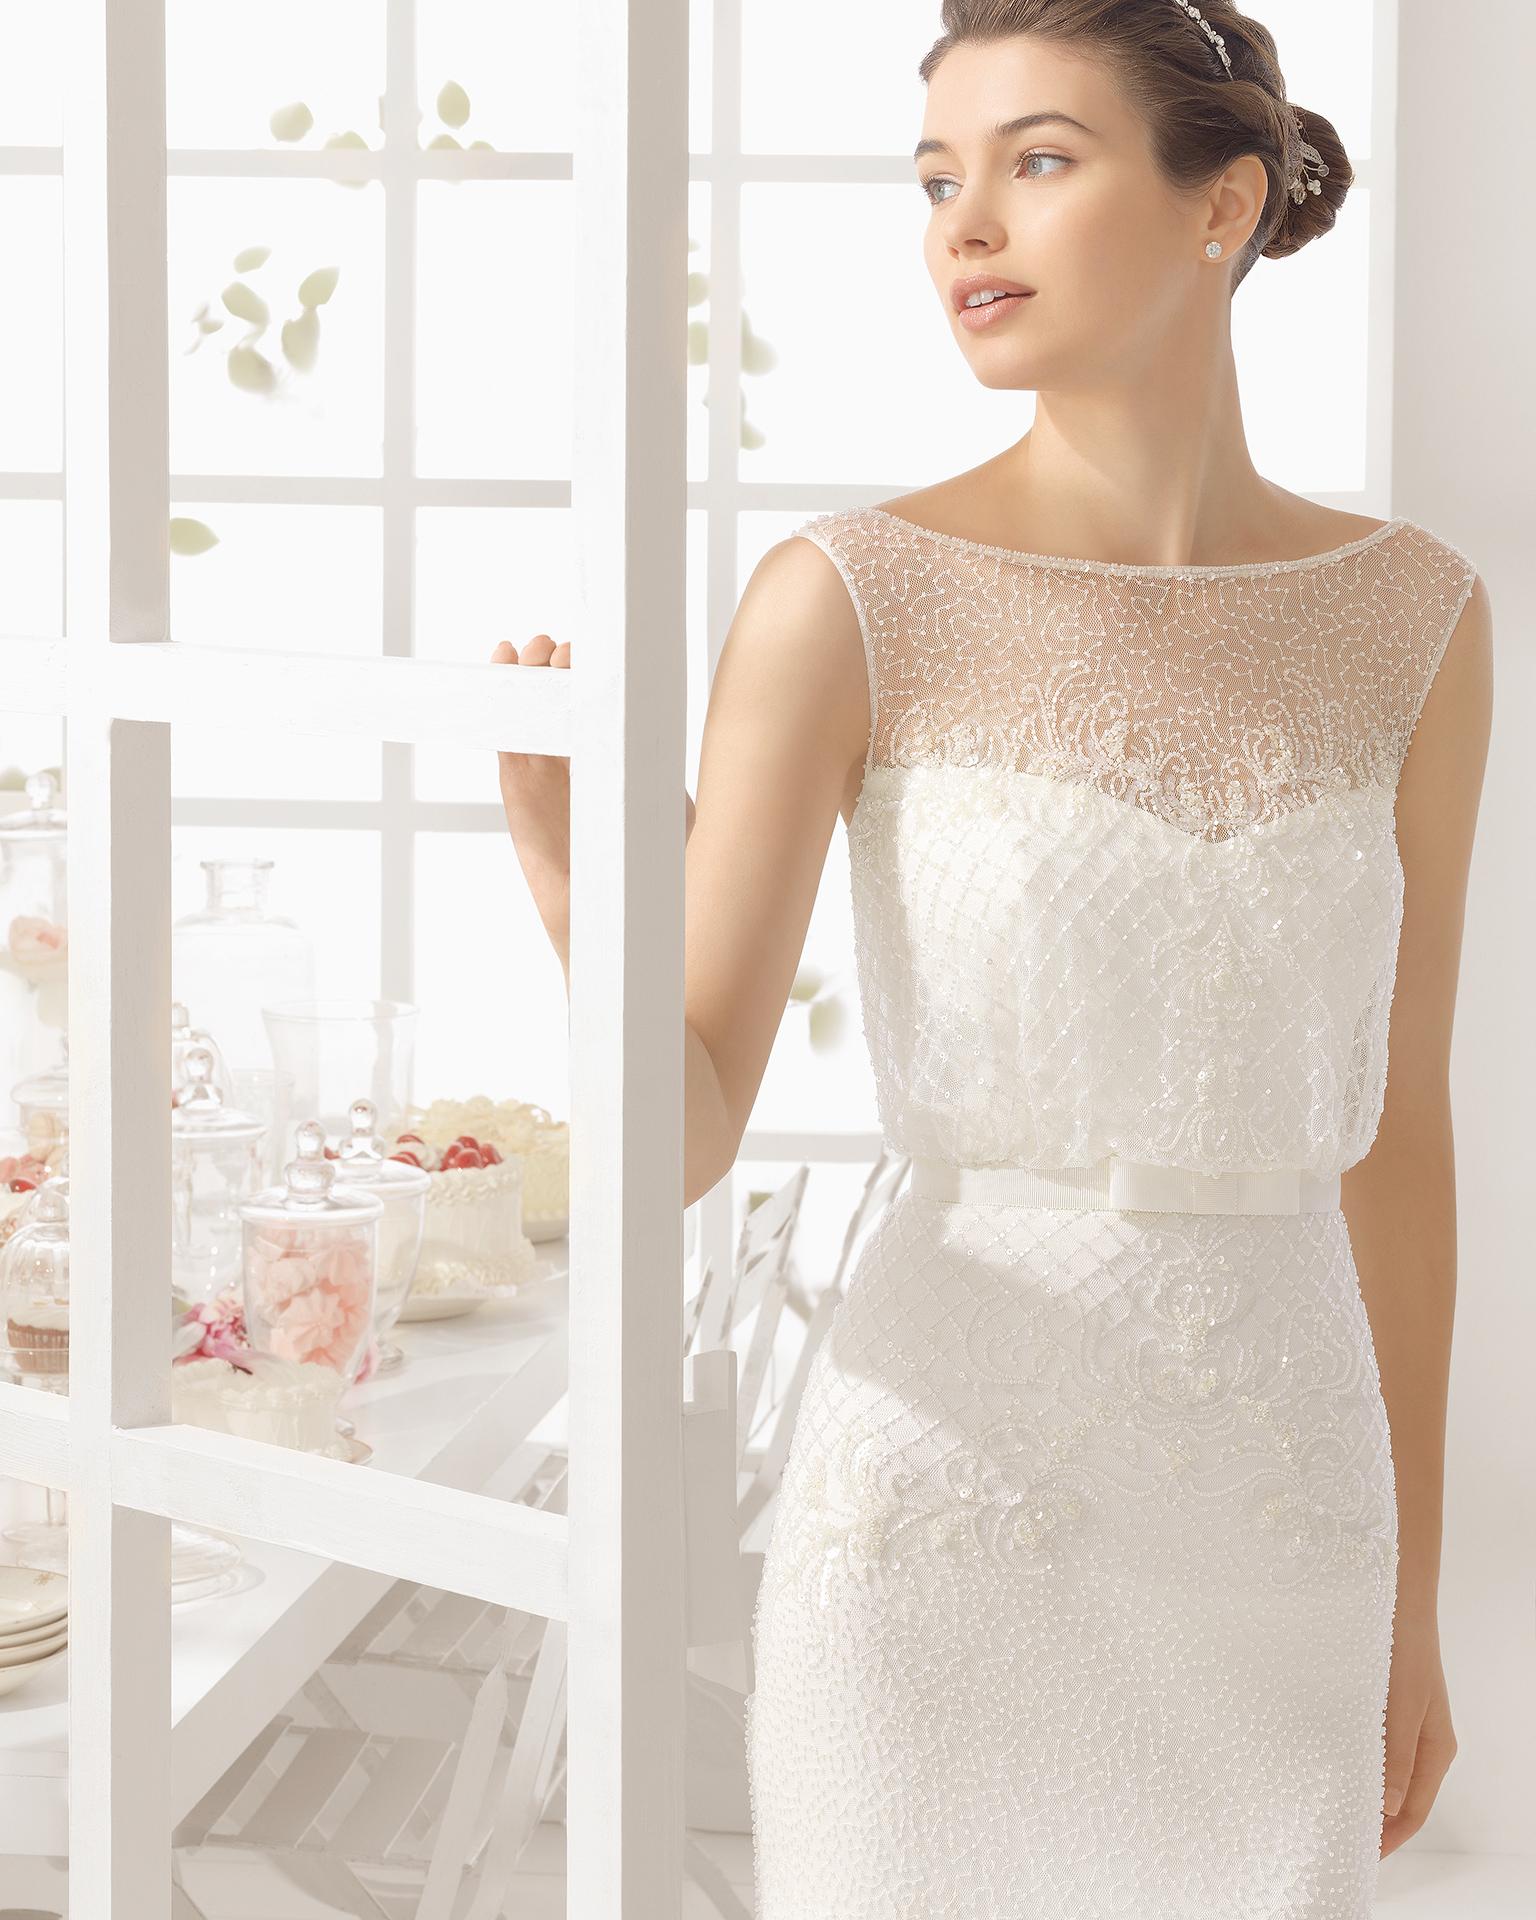 MAEL wedding dress - Aire Barcelona 2016.